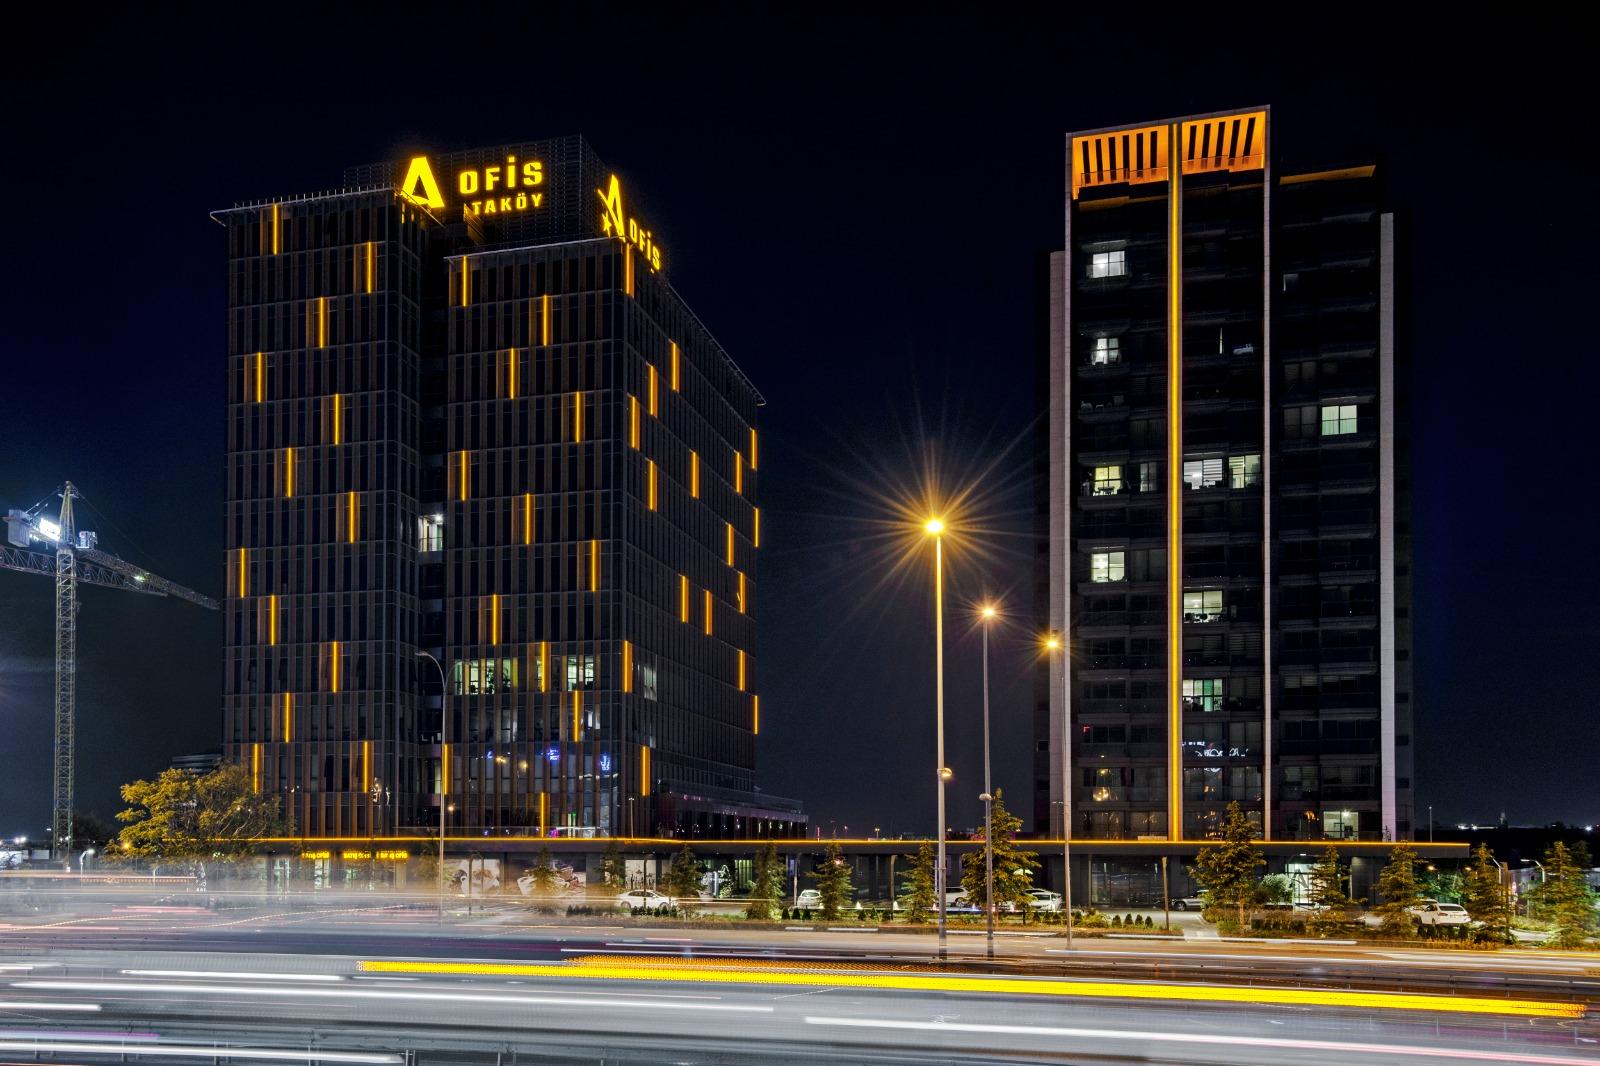 Бизнес-центр с жилыми апартаментами в Атакёе - Фото 24